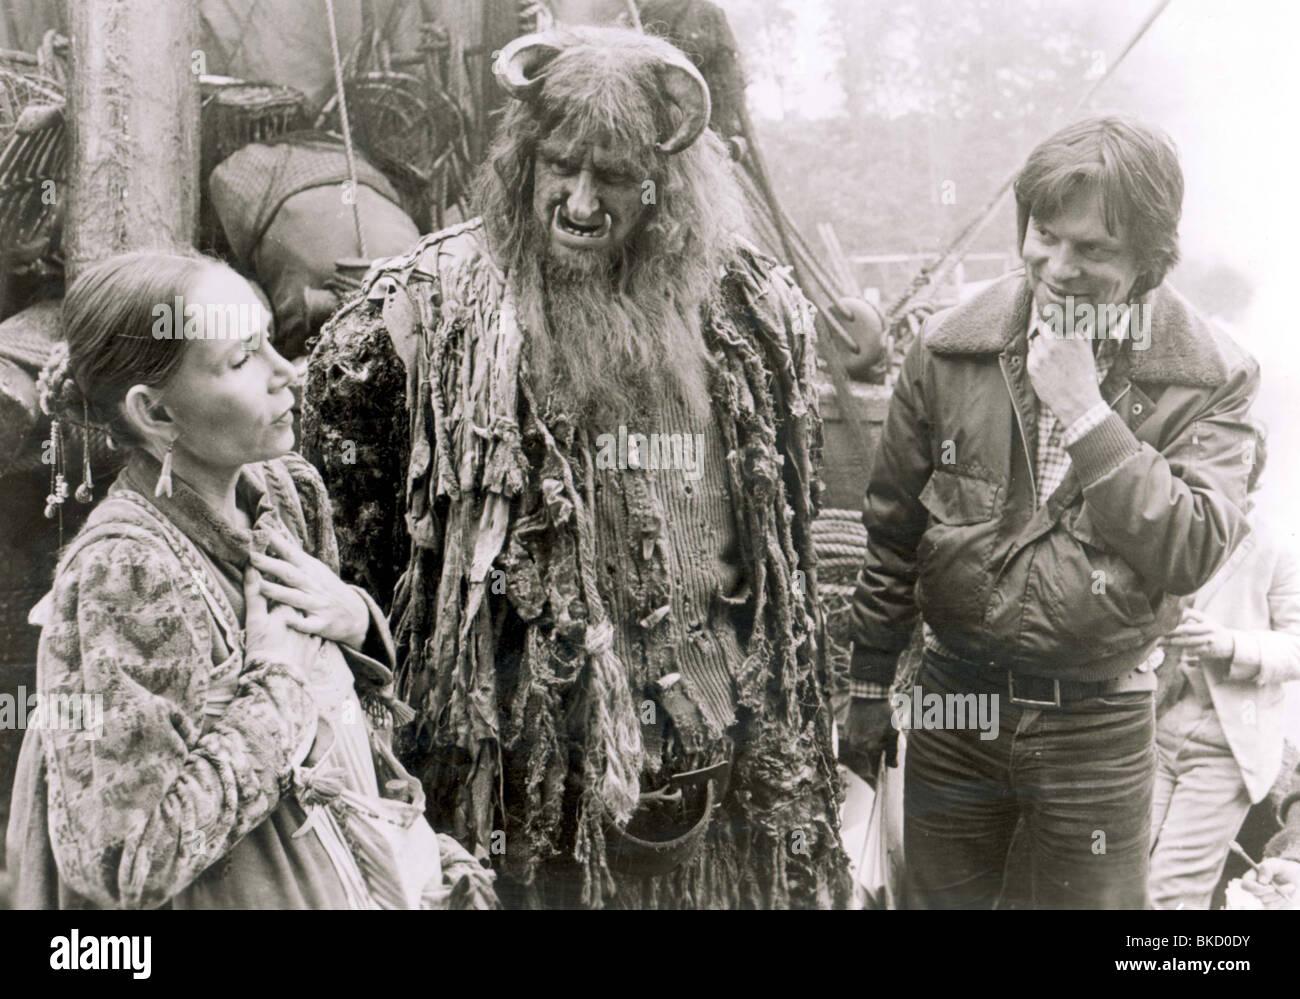 TERRY GILLIAM (DIR) O/S 'TIME BANDITS' (1981) KATHERINE HELMOND, PETER VAUGHAN TYGM 001P - Stock Image